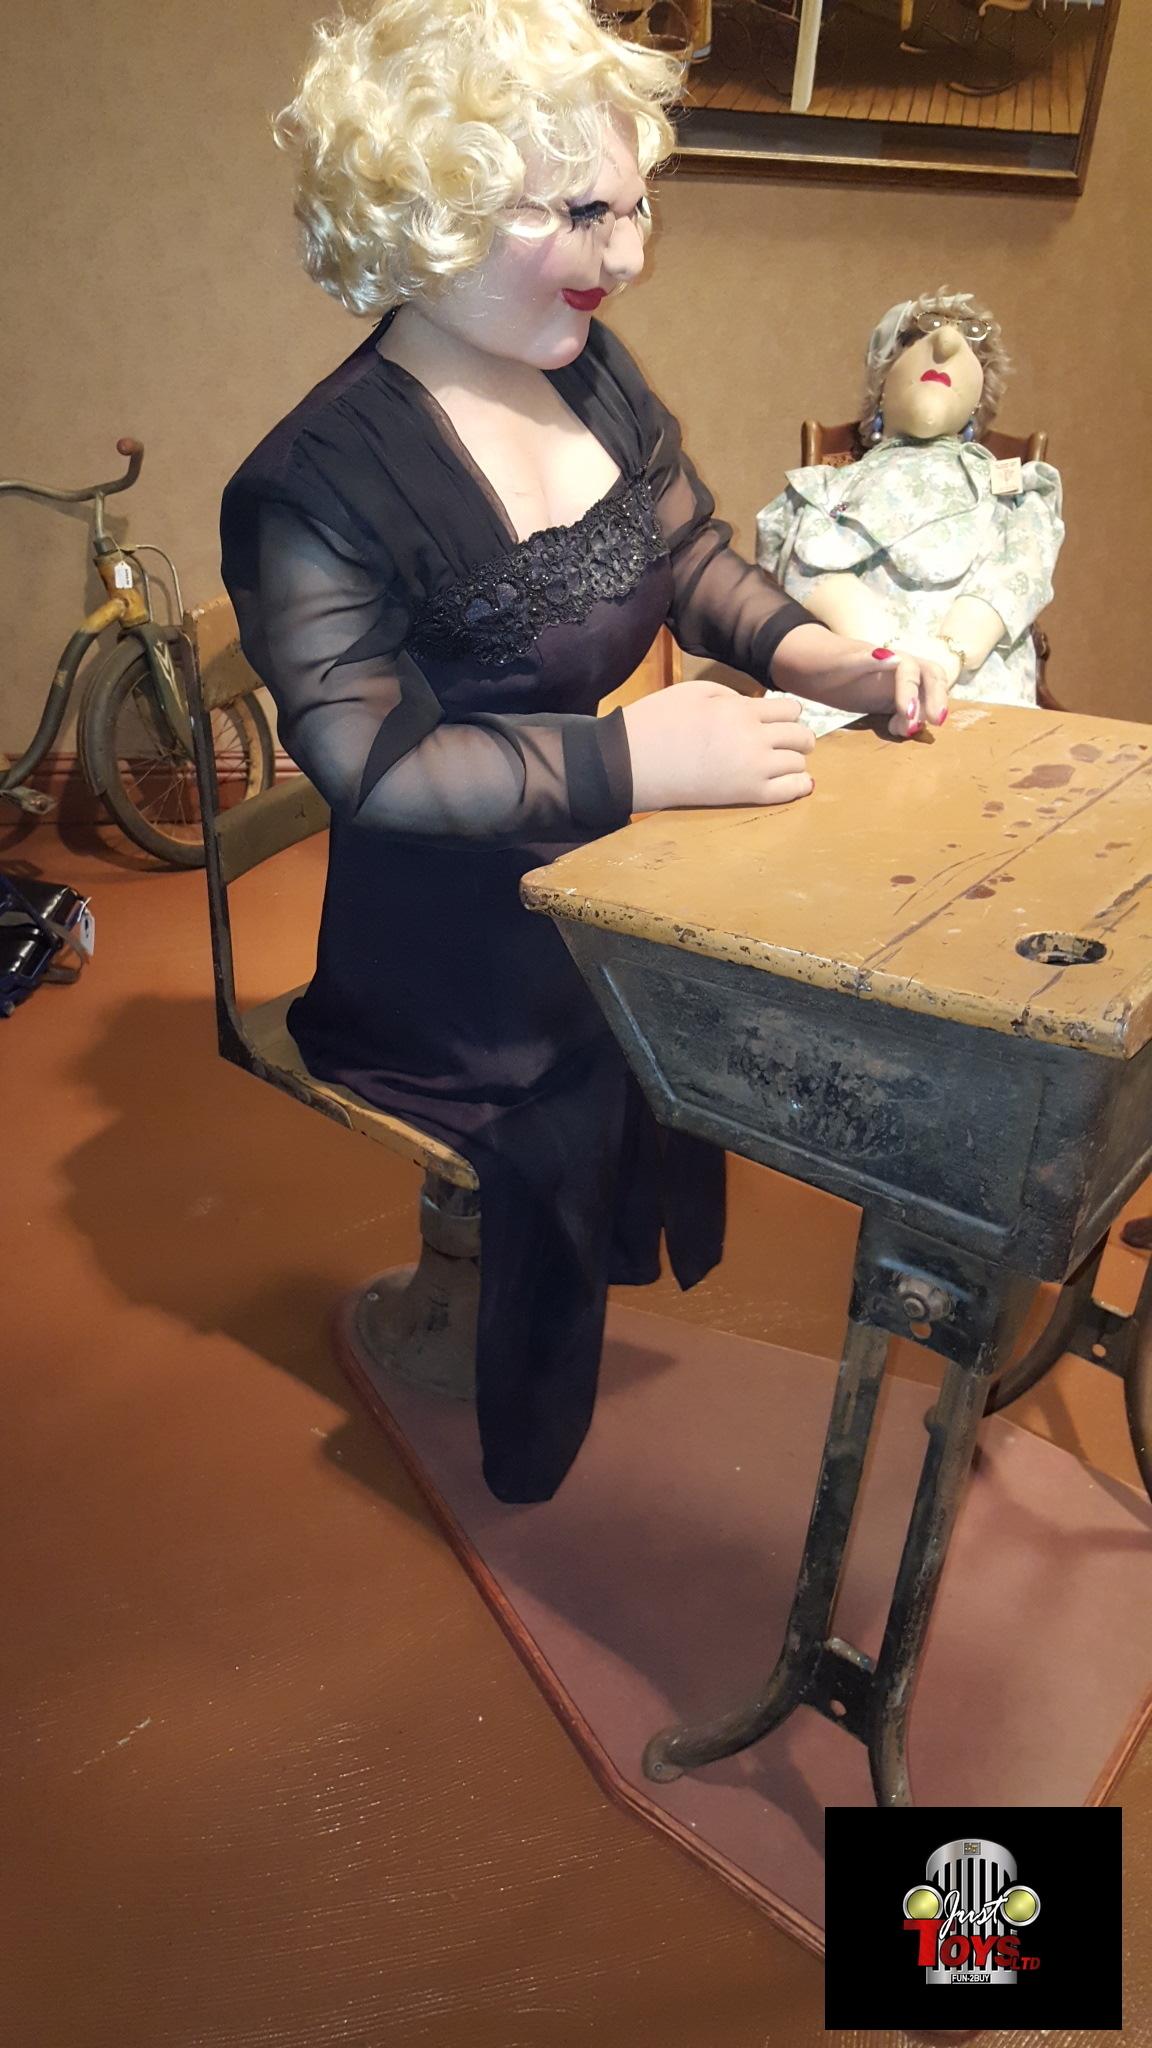 Old School Wood Desk